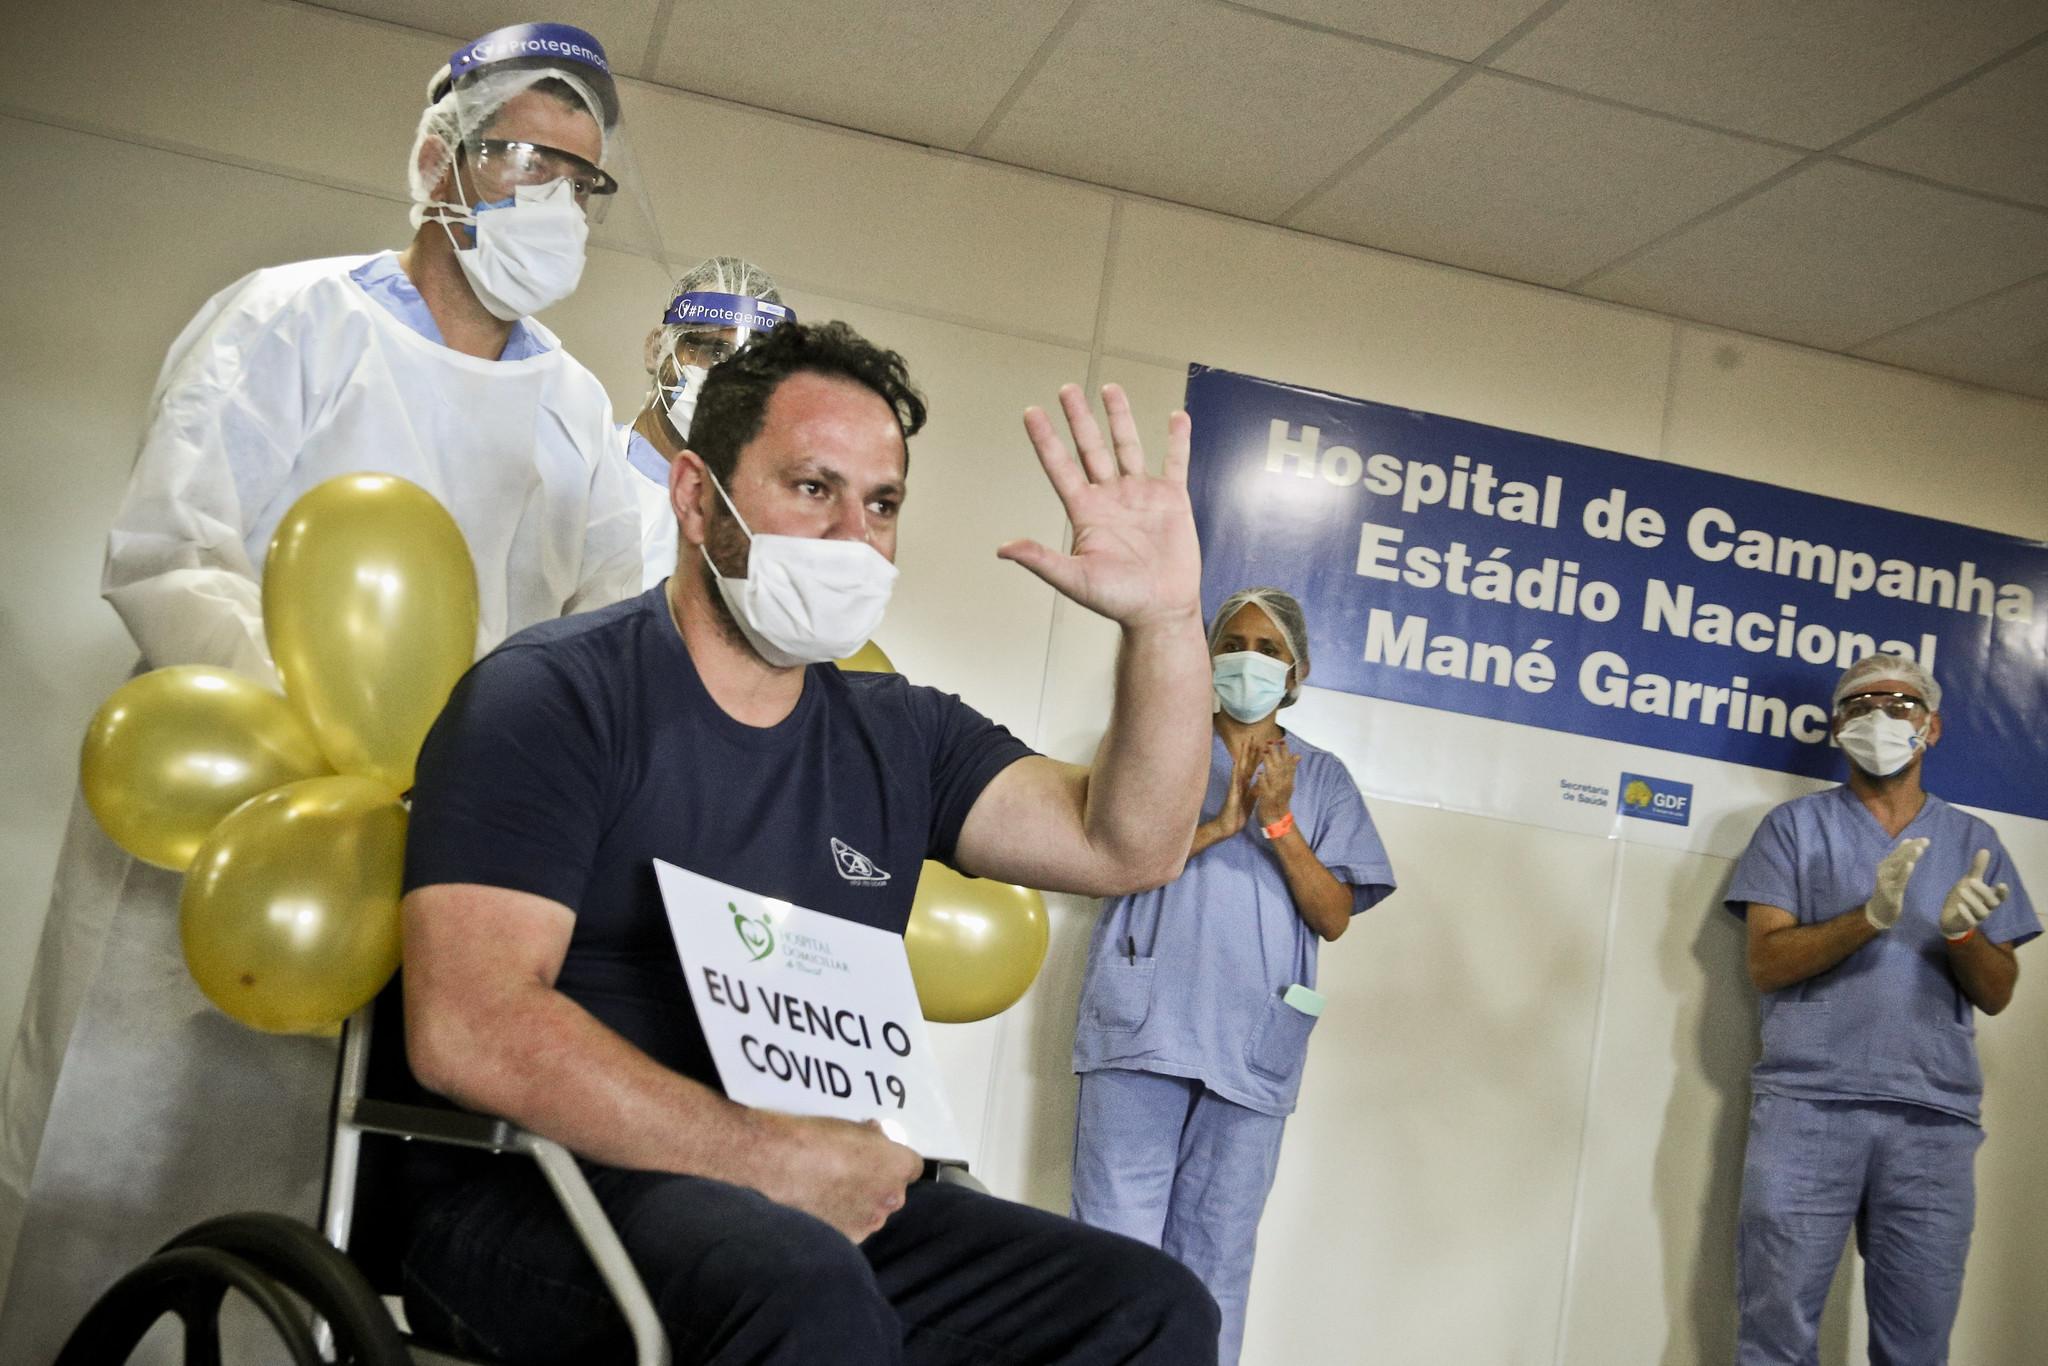 recuperados covid coronavirus brasilia distrito federal hospital de campanha estadio nacional